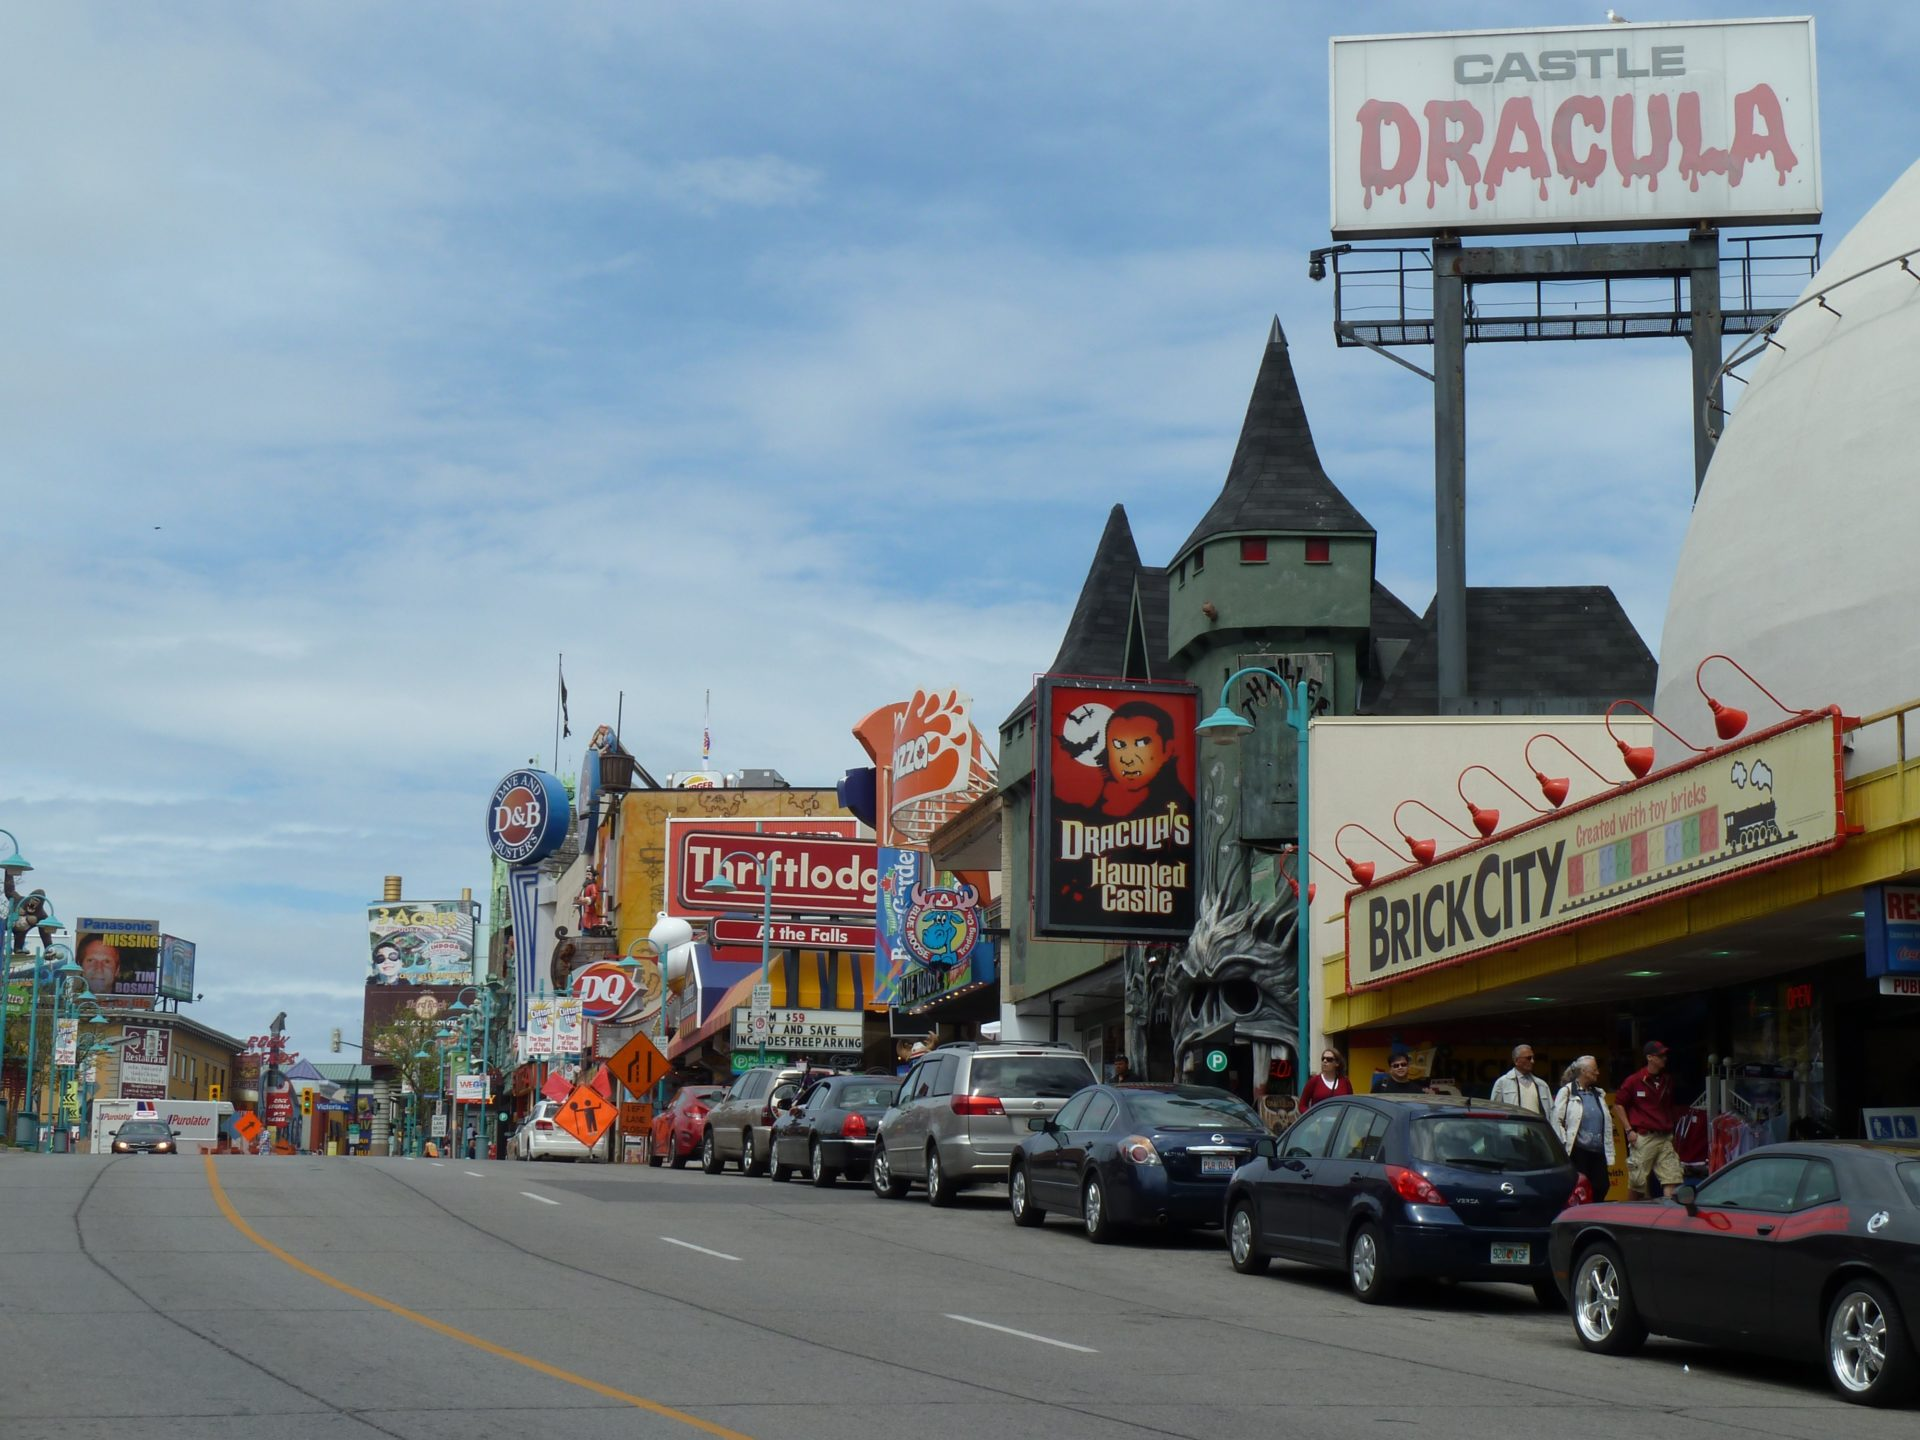 Reklamy domów strachów w centrum Niagara Falls